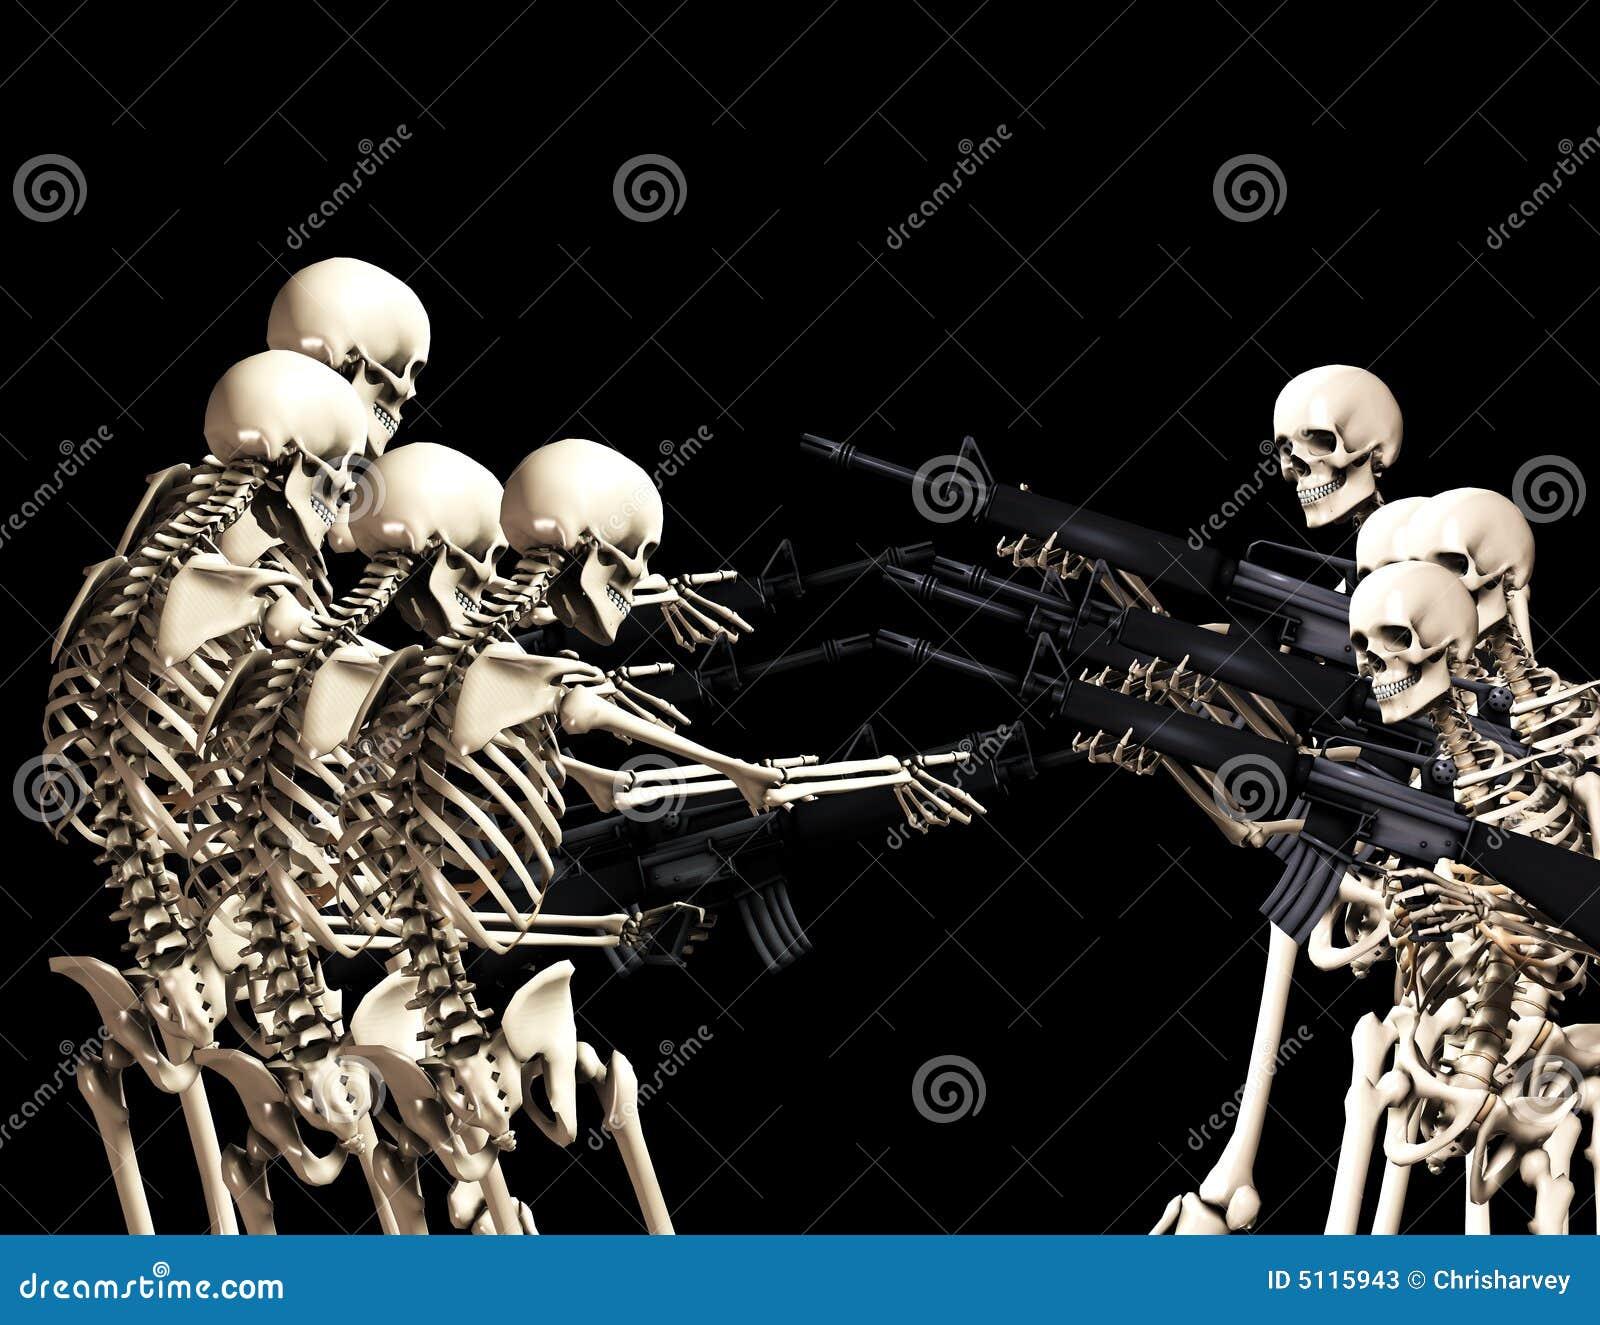 ♕ SPIRIT BRINGERS: EMPYREAN REALM. (SAGA DE UNUKALHAI) - Página 19 Many-war-skeletons-3-5115943